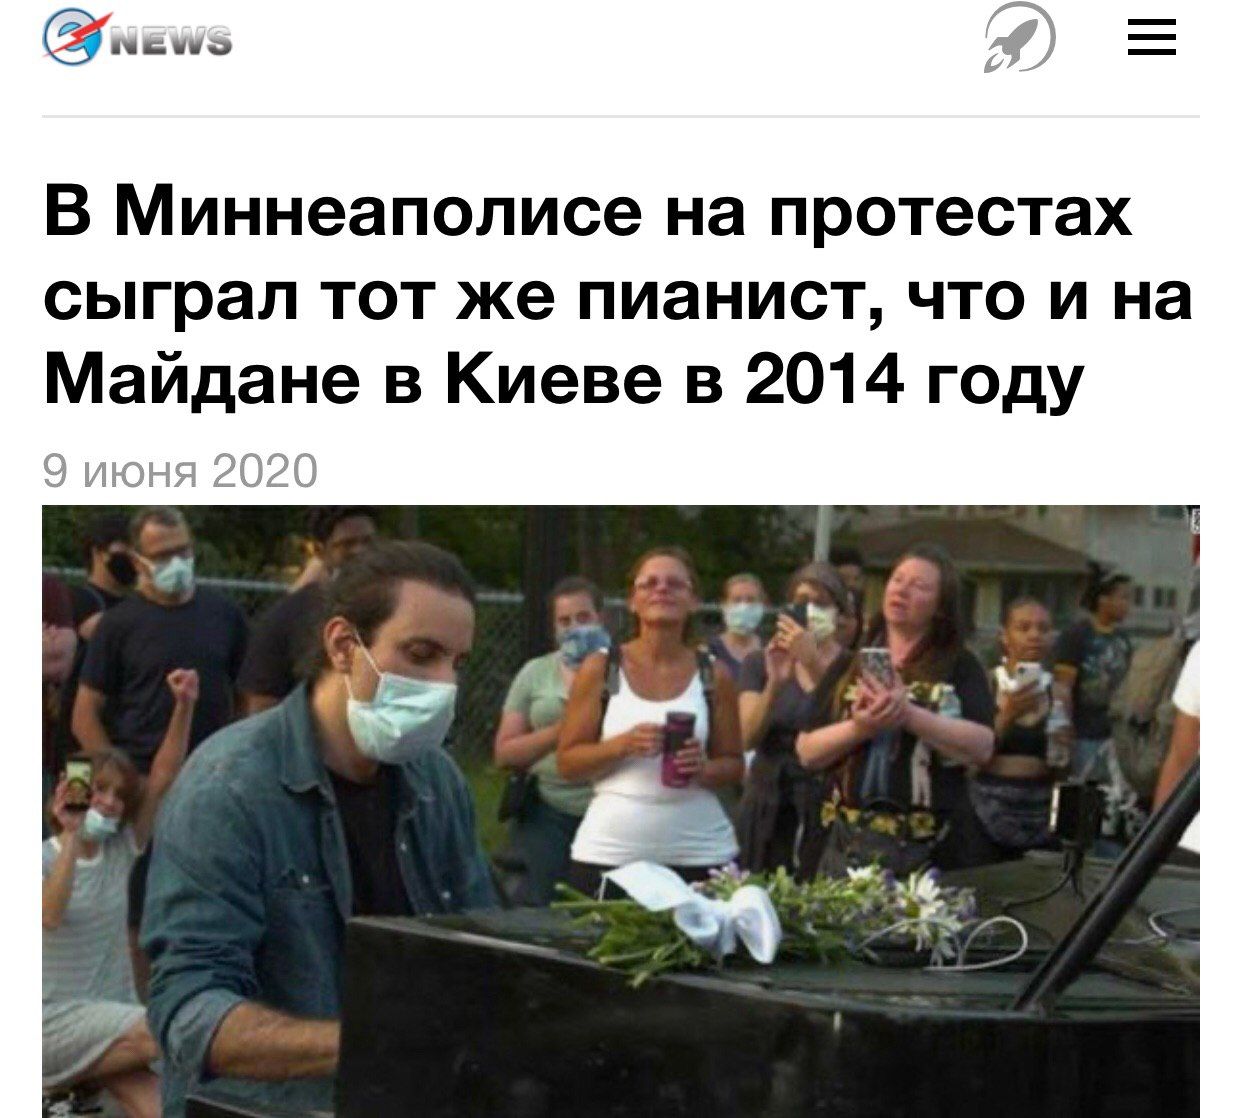 https://i1.imageban.ru/out/2020/06/11/58740dd271cf9c5c7d86b430f6a1132e.jpg